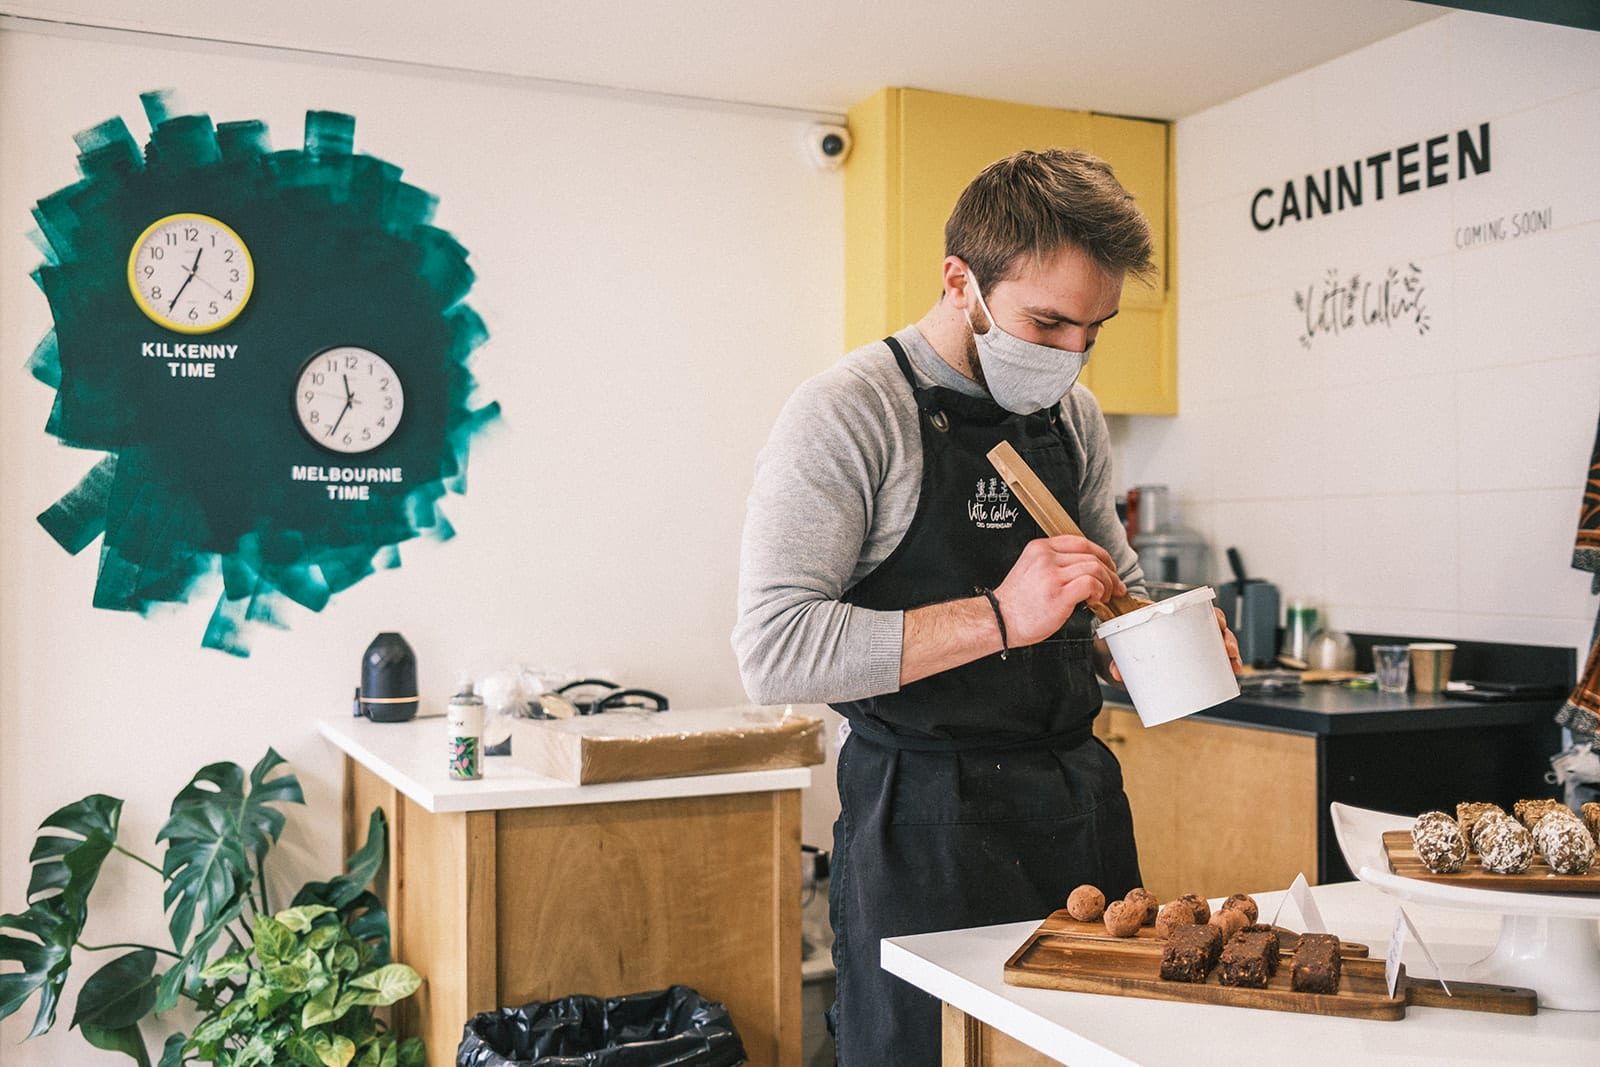 Raided Irish CBD store aims to change Ireland's strict hemp laws Little Collins